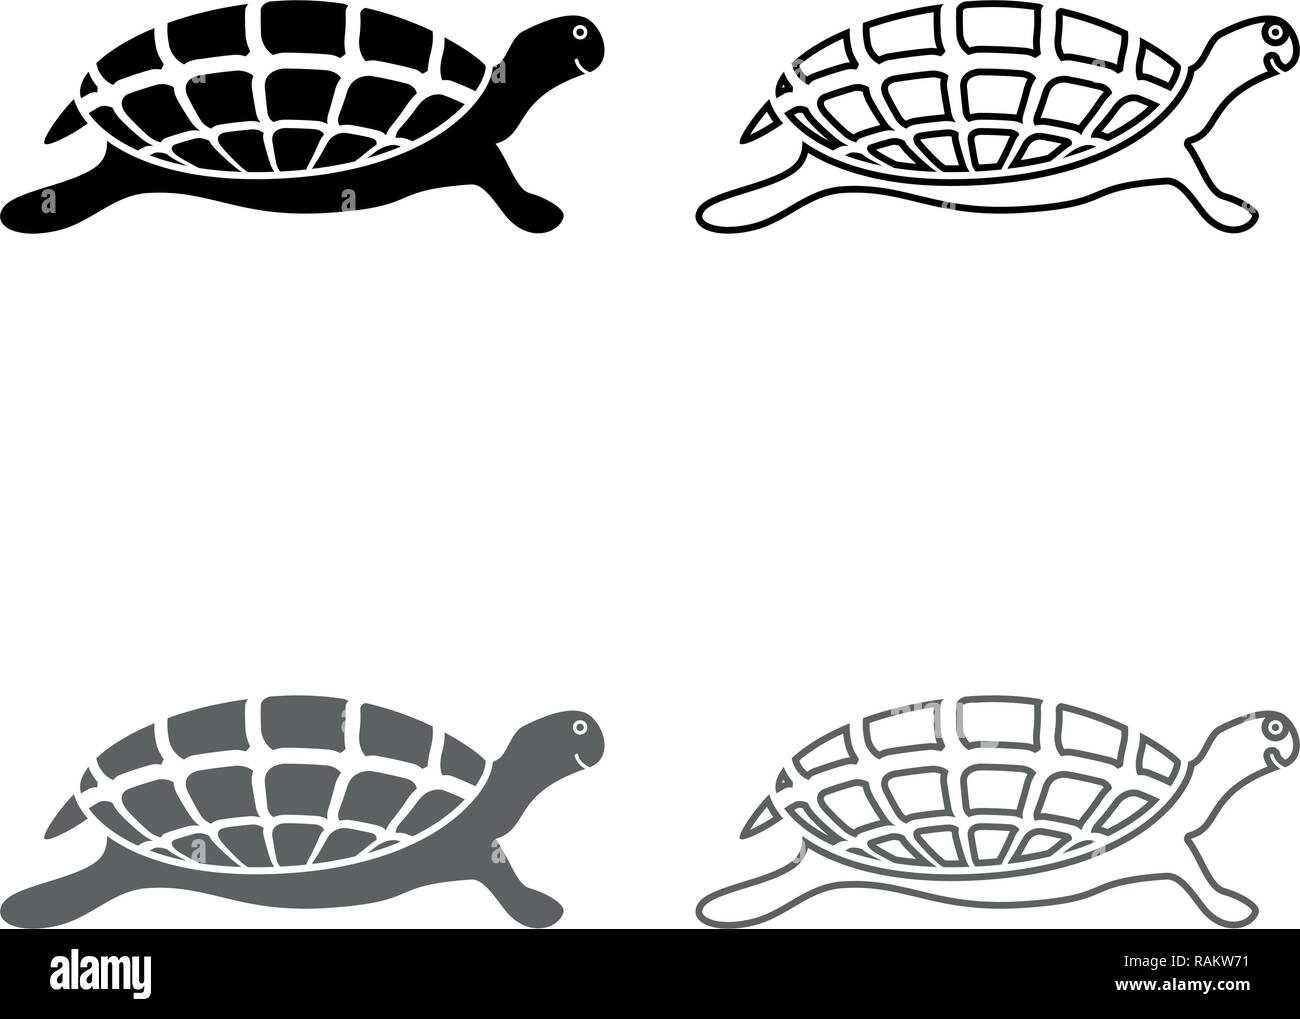 a5c36af5c Turtle tortoise icon set grey black color vector I outline flat style simple  image